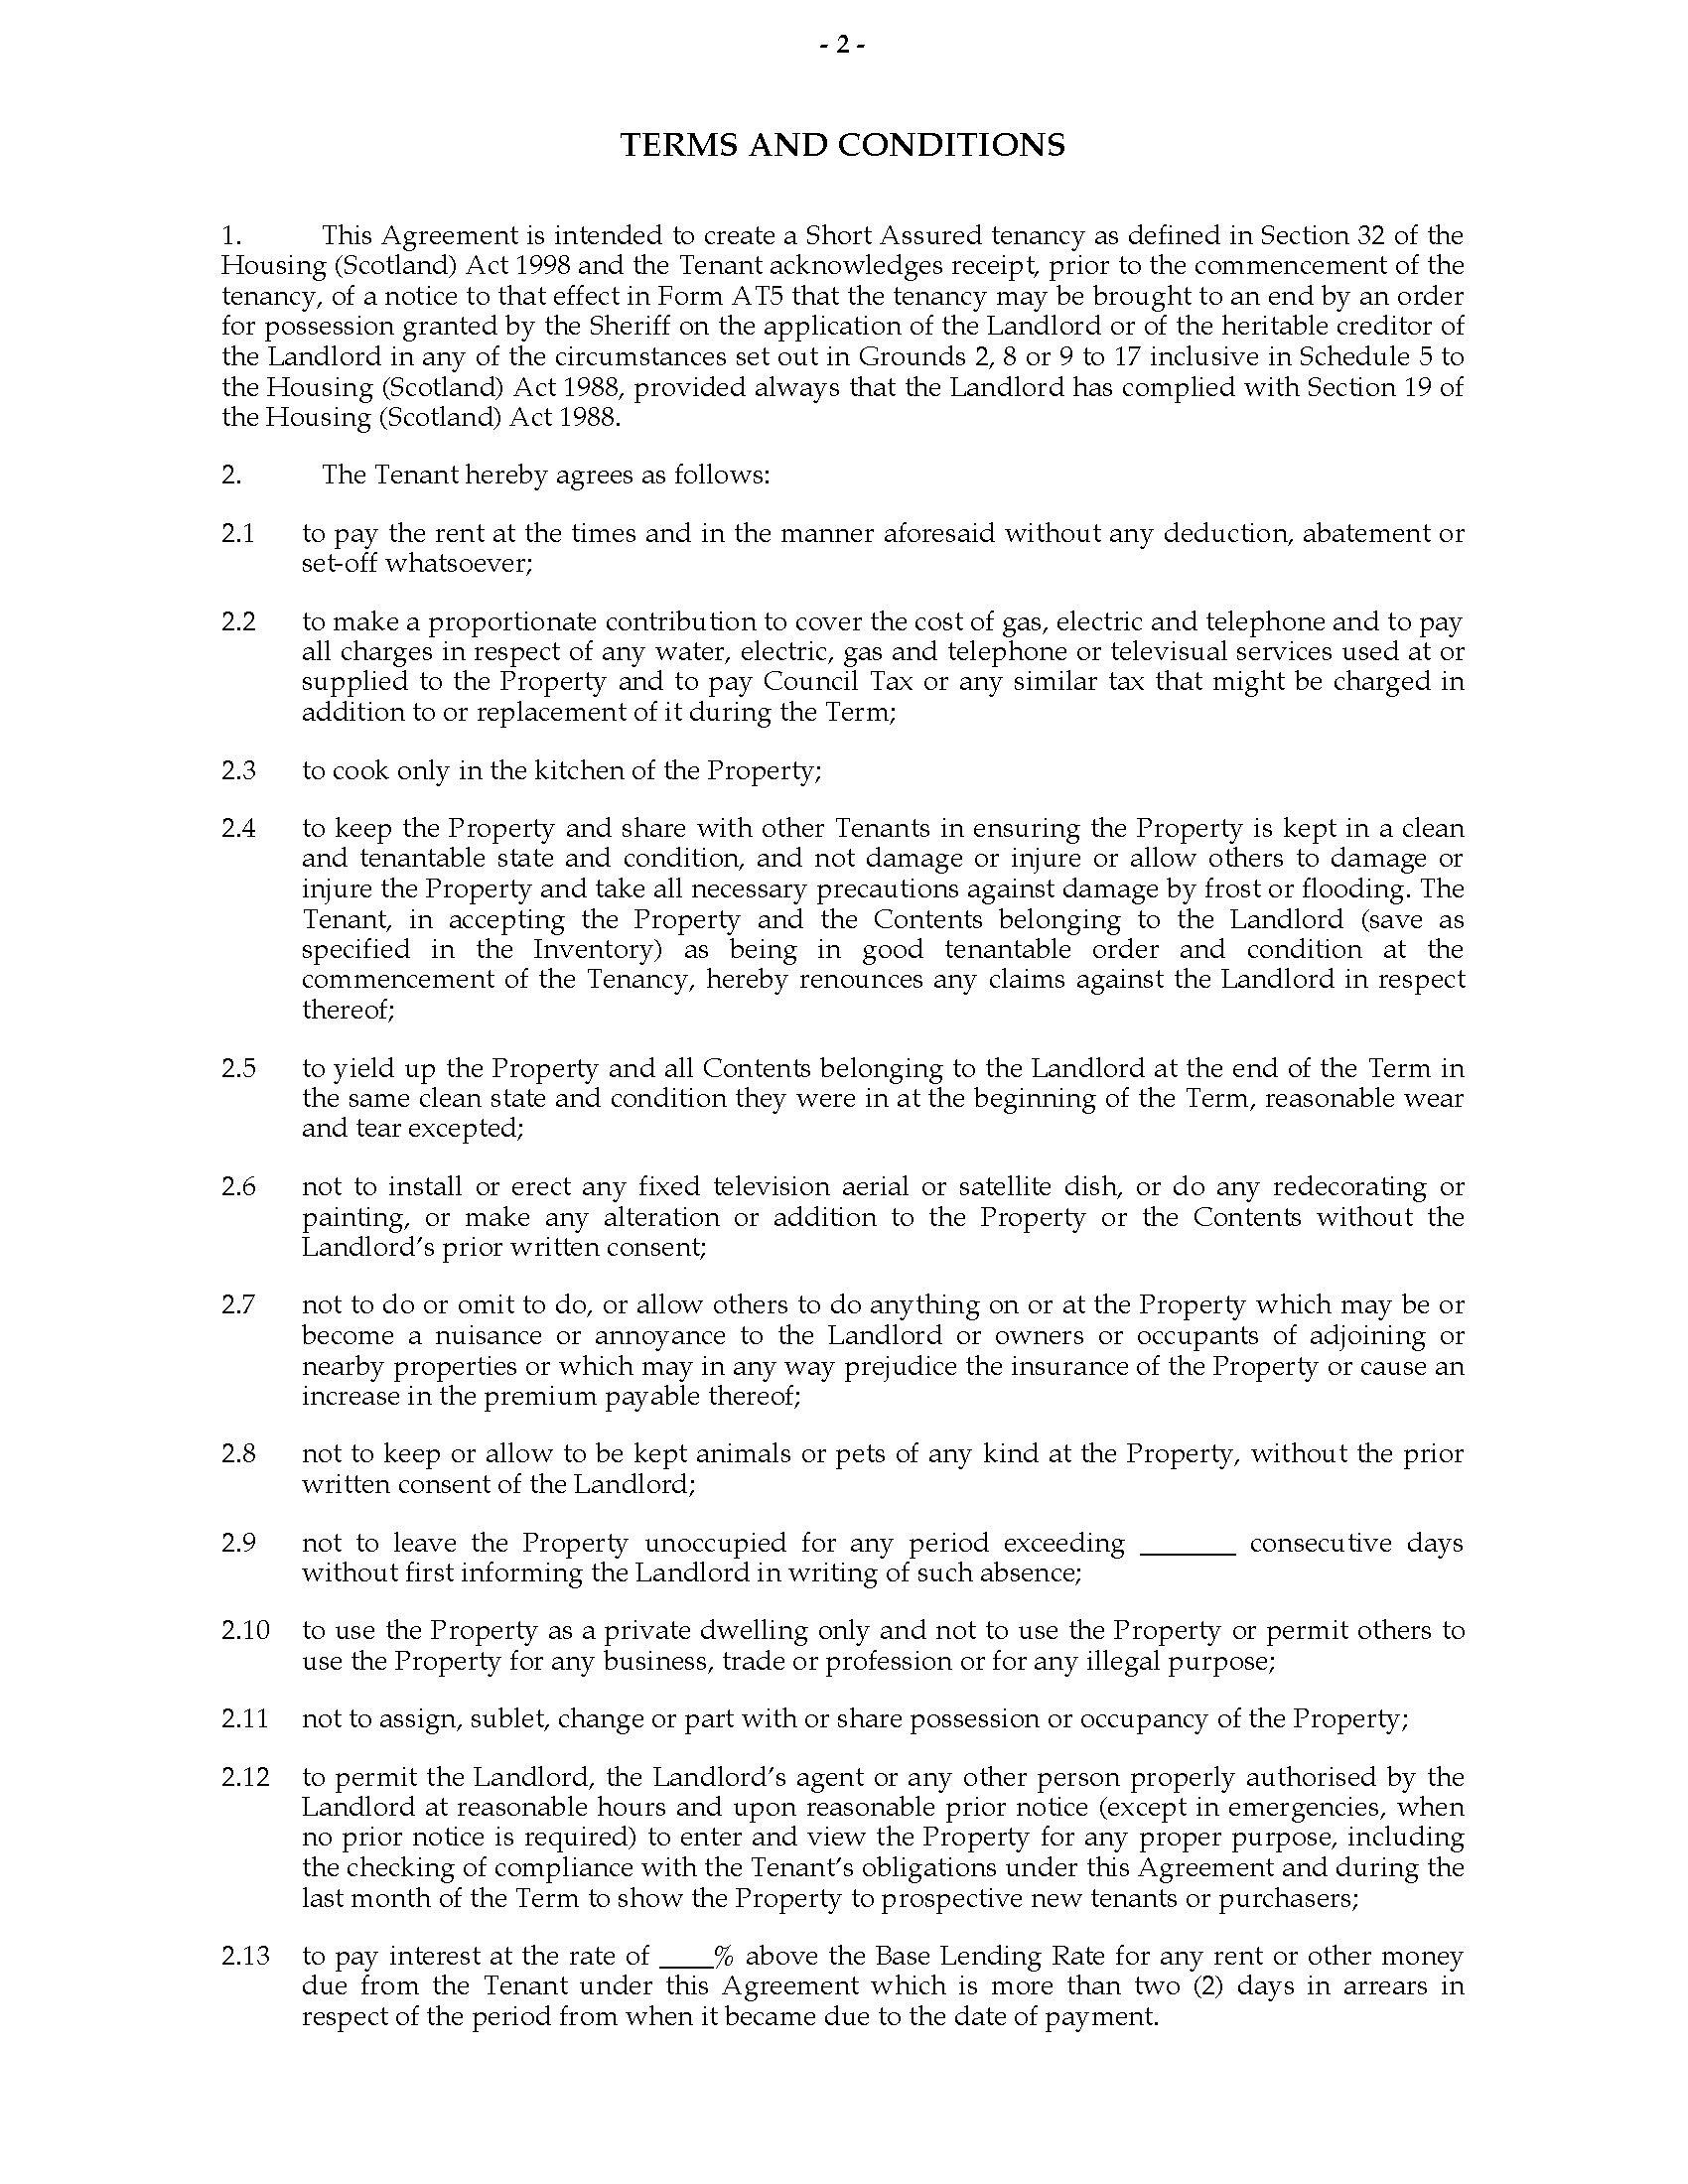 Scottish Multiple Occupancy Short Assured Tenancy Agreement  Legal Throughout Scottish Short Assured Tenancy Agreement Template